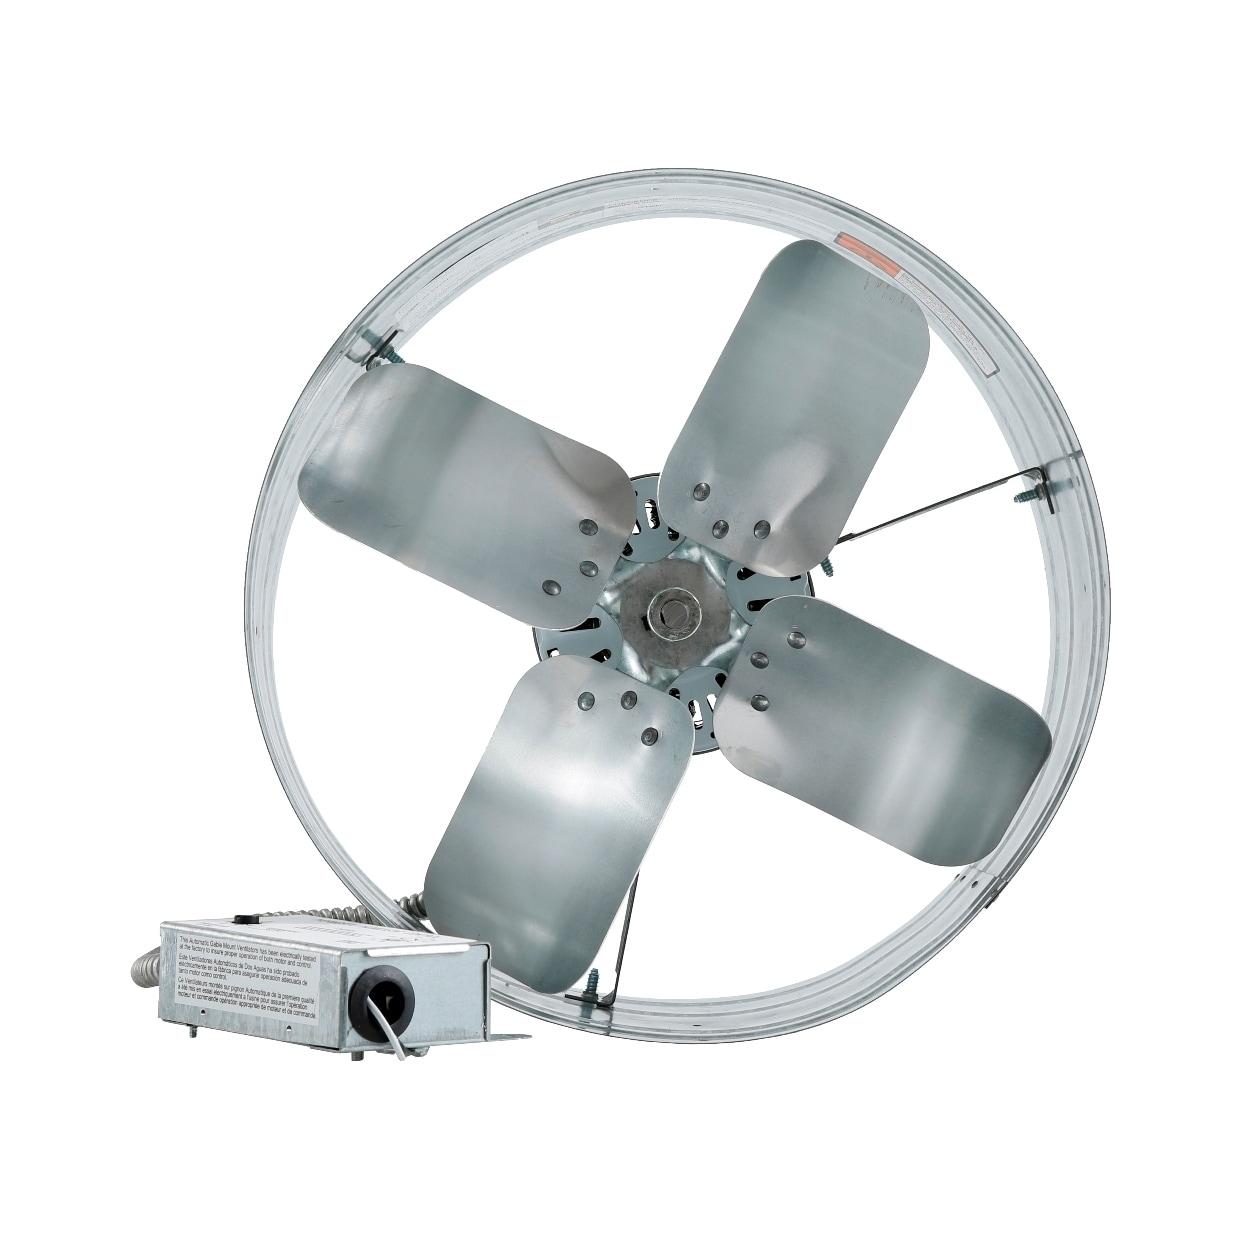 USA iLIVING Automatic Gable Mount Attic Ventilator Fan wi...